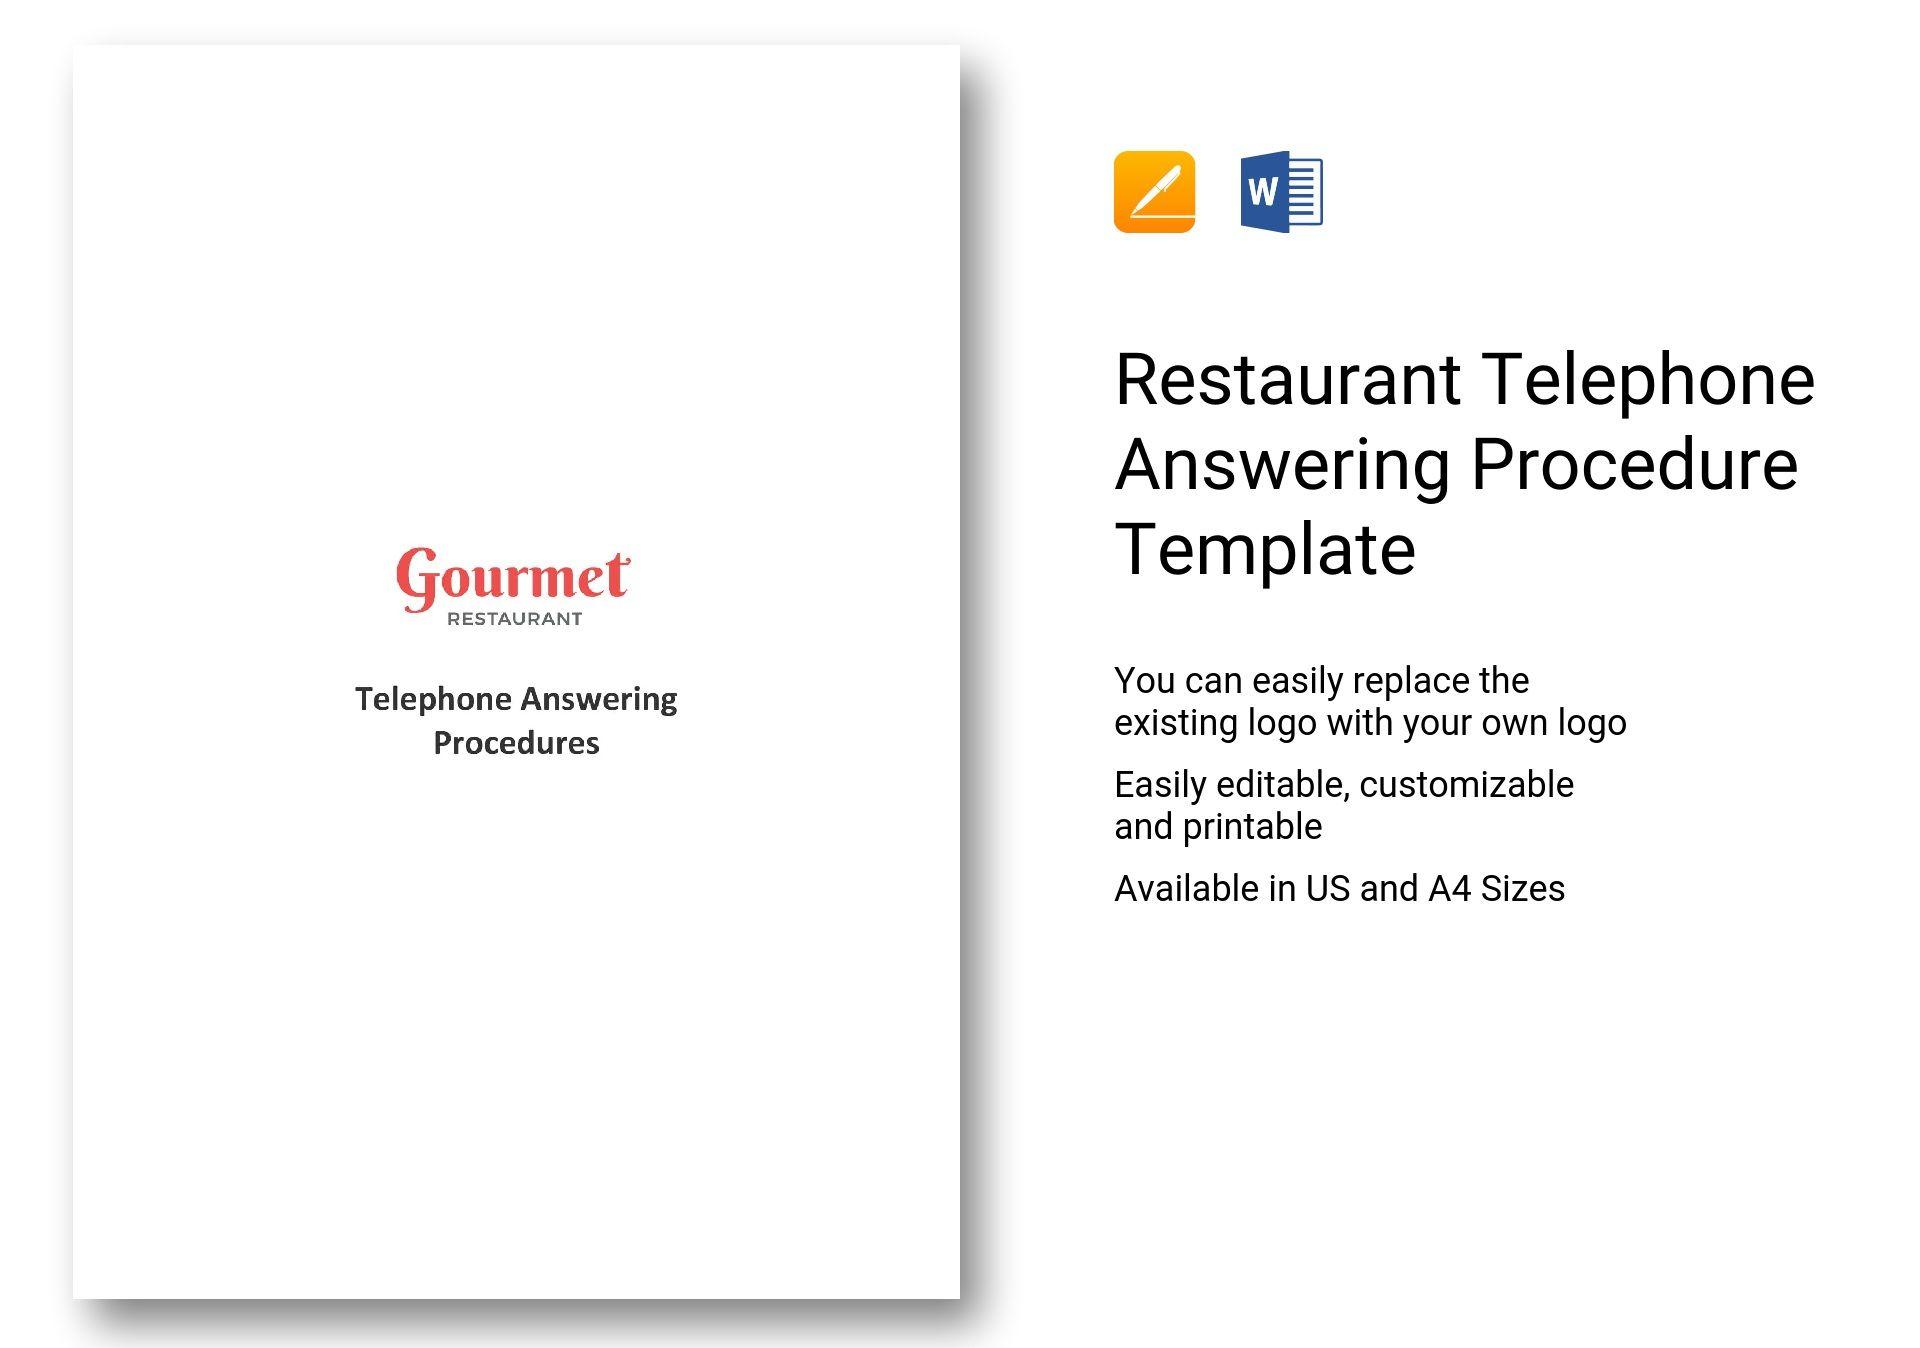 Restaurant Telephone Answering Procedure